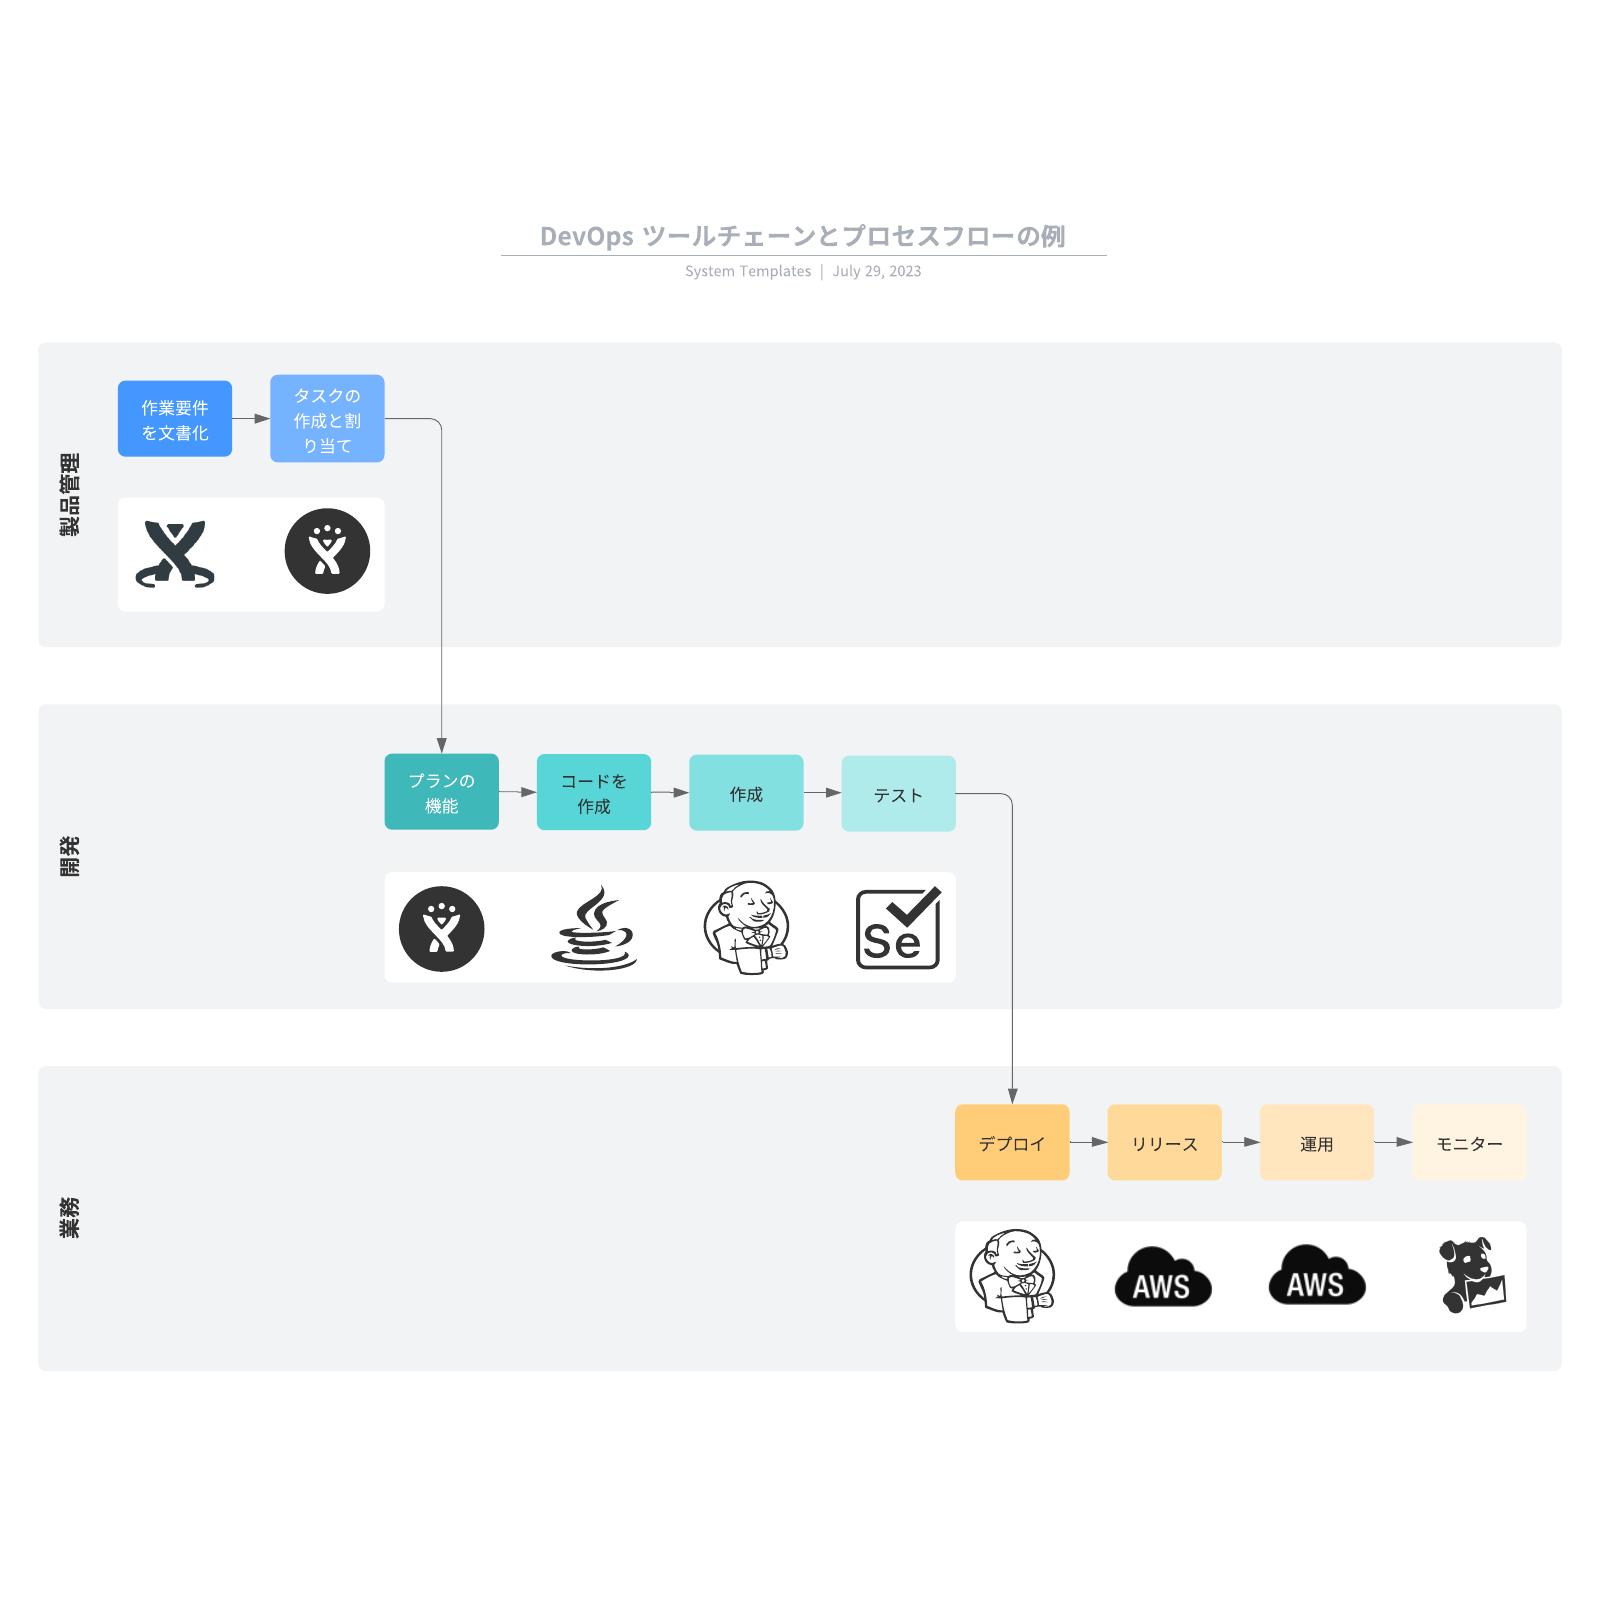 DevOps ツールチェーンとプロセスフローの例